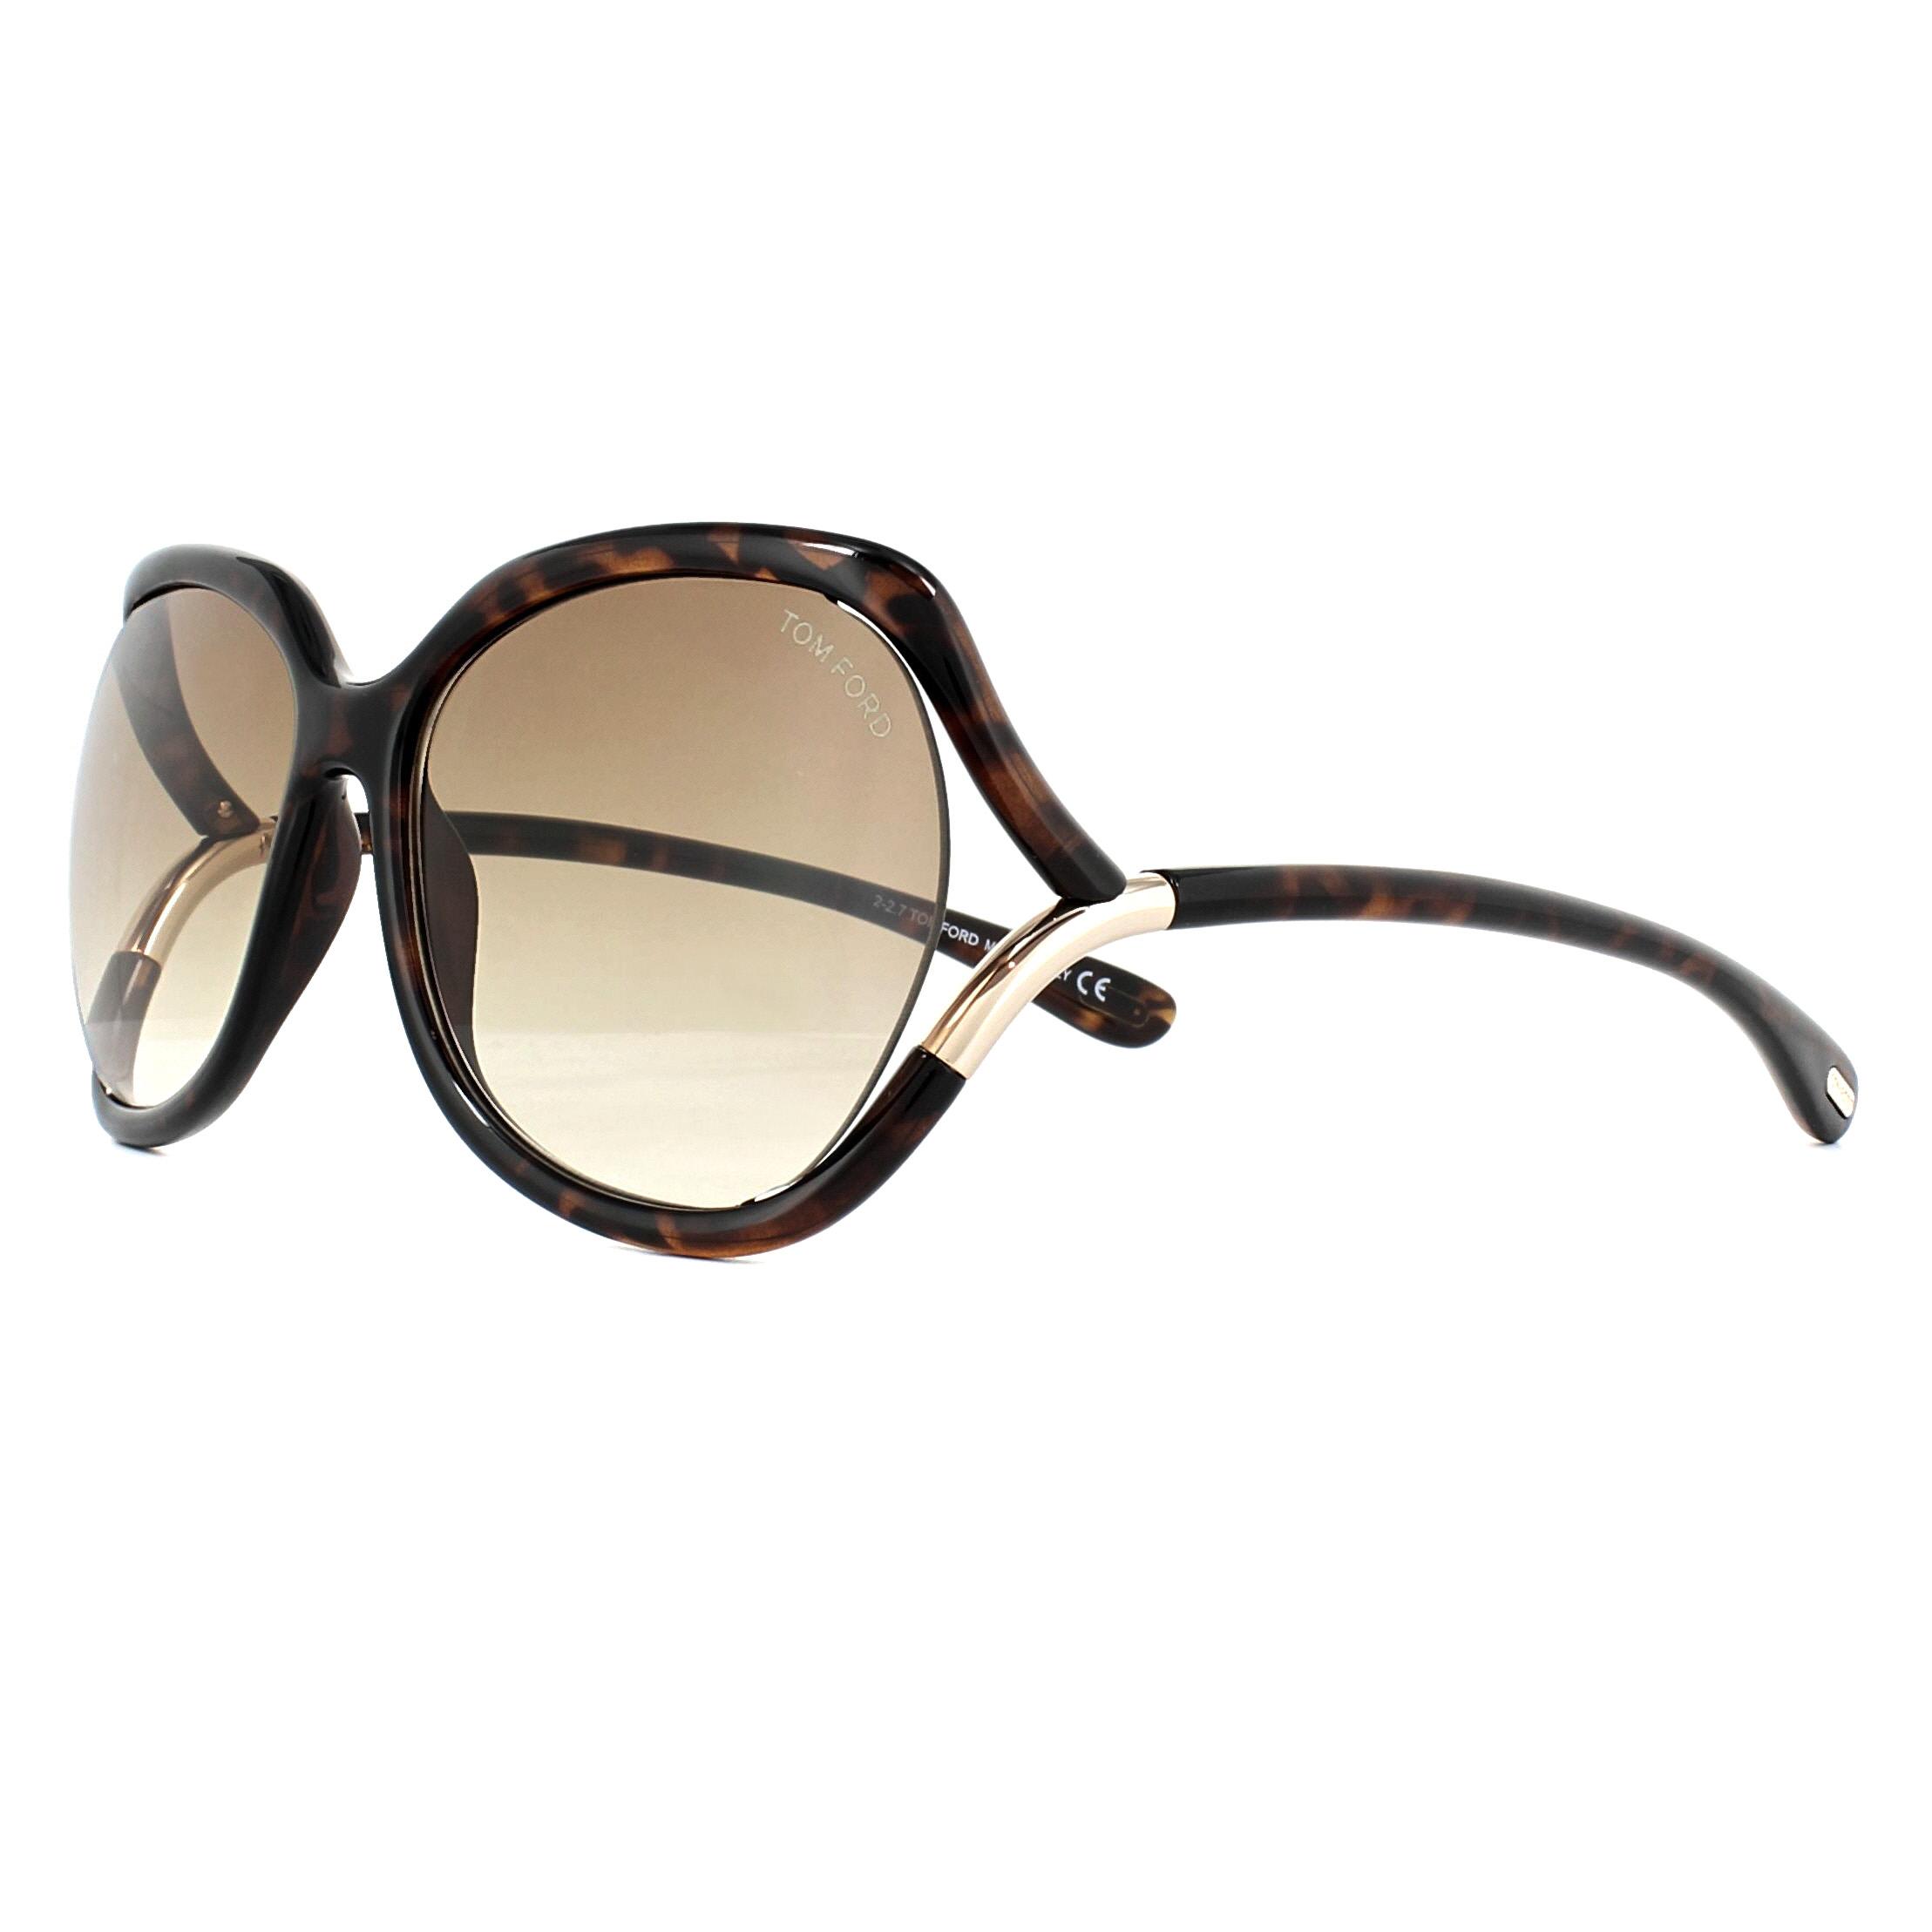 83a3e7e6c8a2 Sentinel Tom Ford Sunglasses 0578 Anouk 52F Dark Havana Brown Gradient